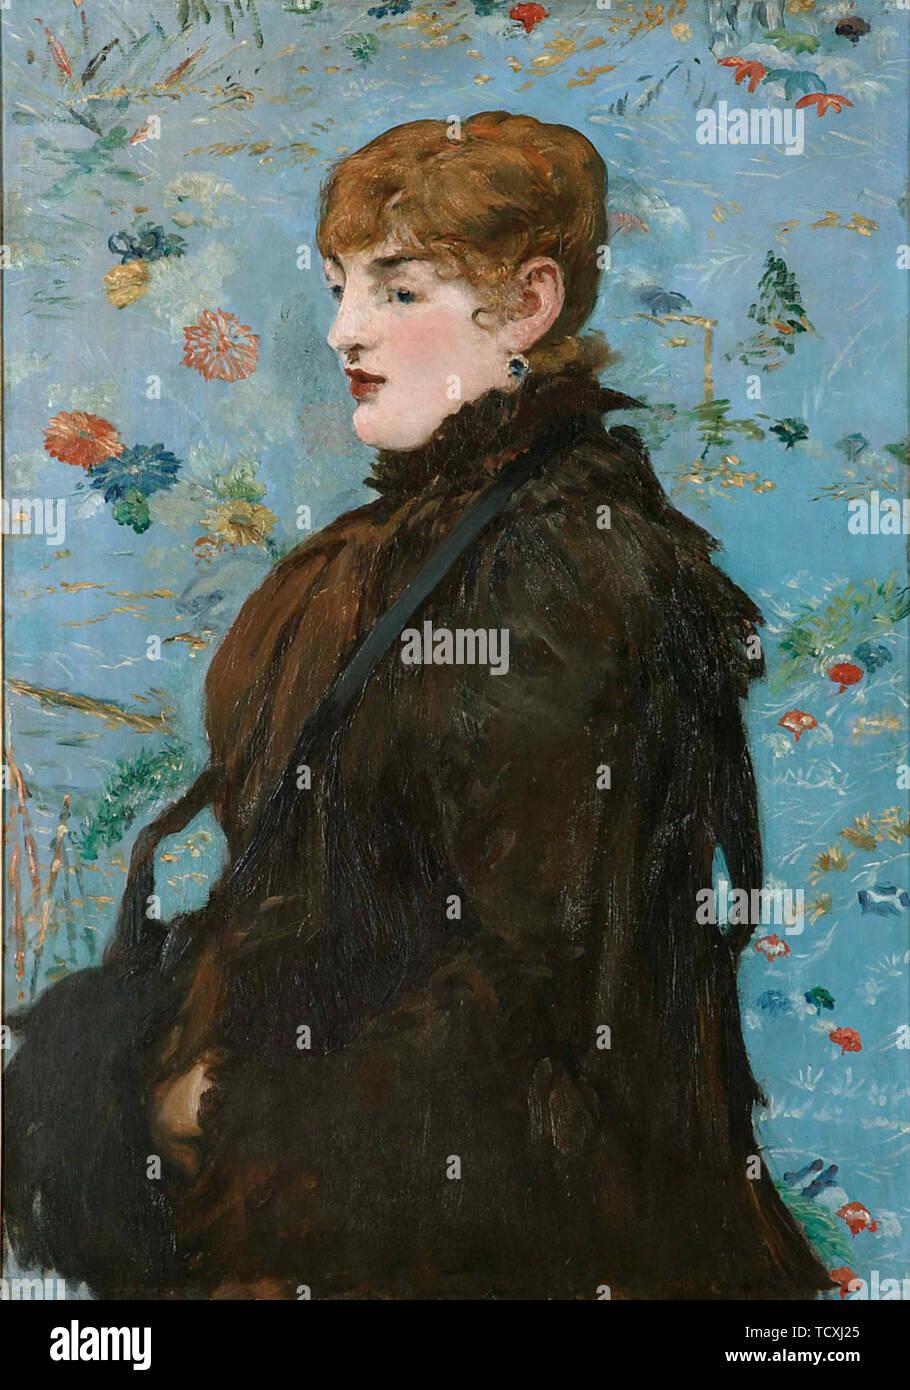 Herbst. Portrait von Méry Laurent, 1882. Schöpfer: Manet, Édouard (1832-1883). Stockfoto